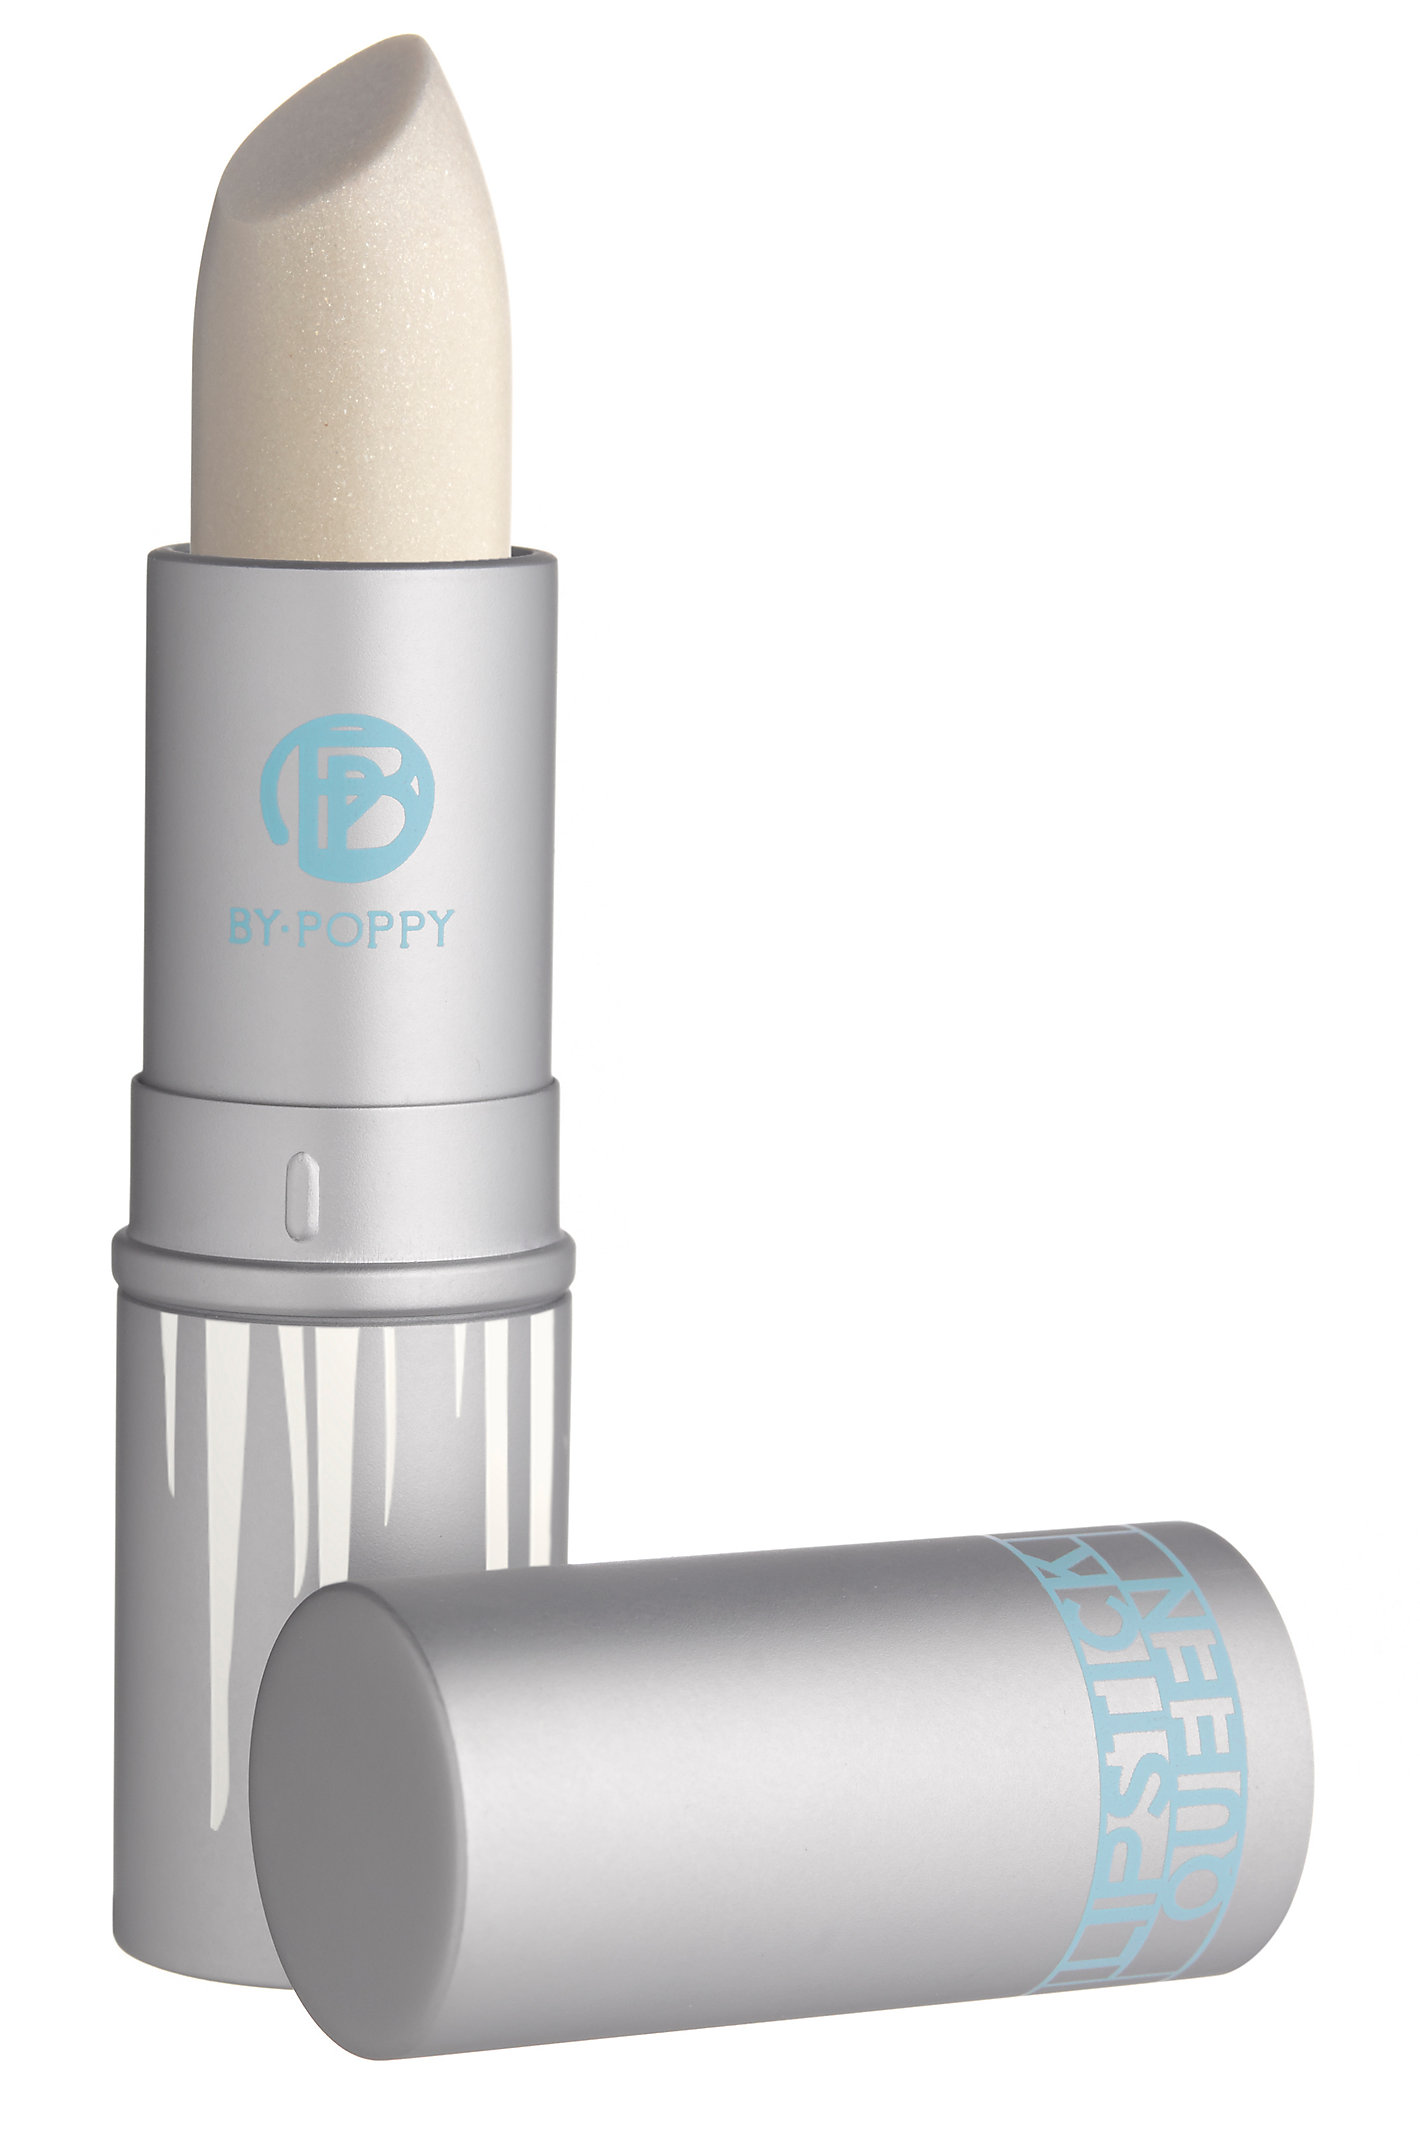 Lipstick Qn Ice Queen Lipstick